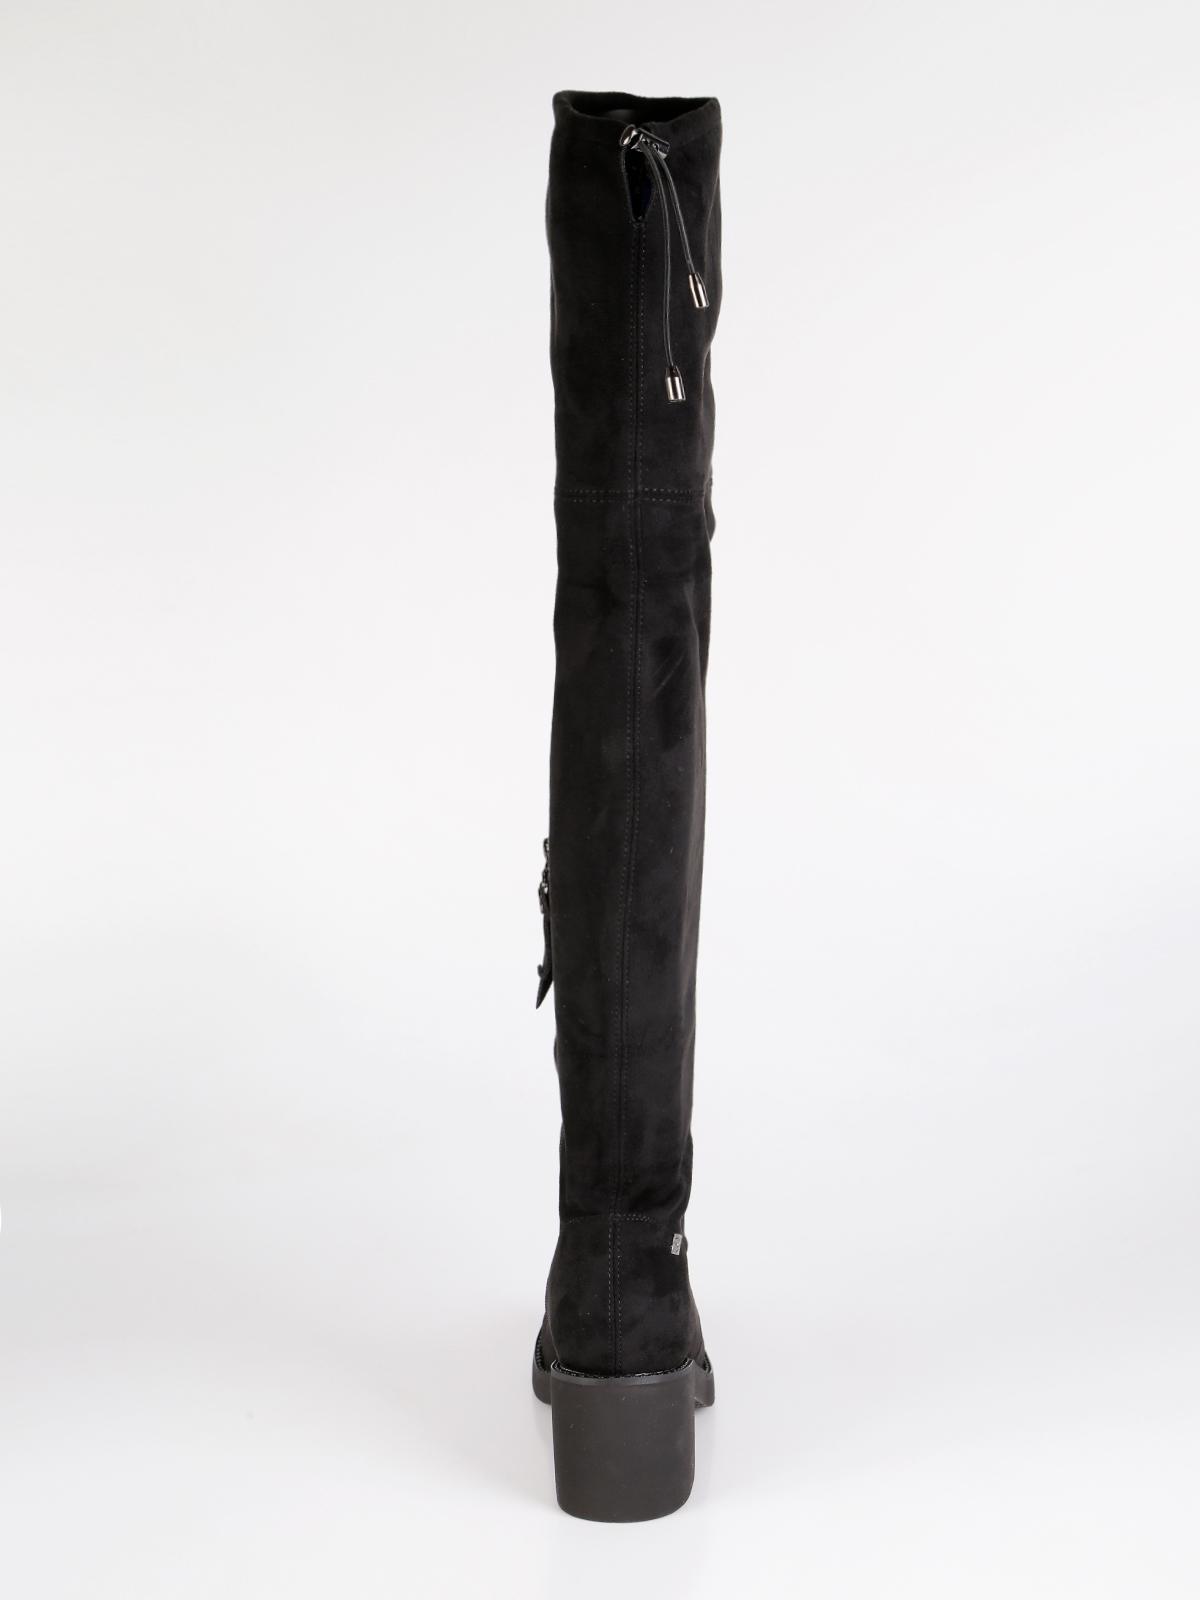 Stivali sopra il ginocchio nero braccialini   MecShopping